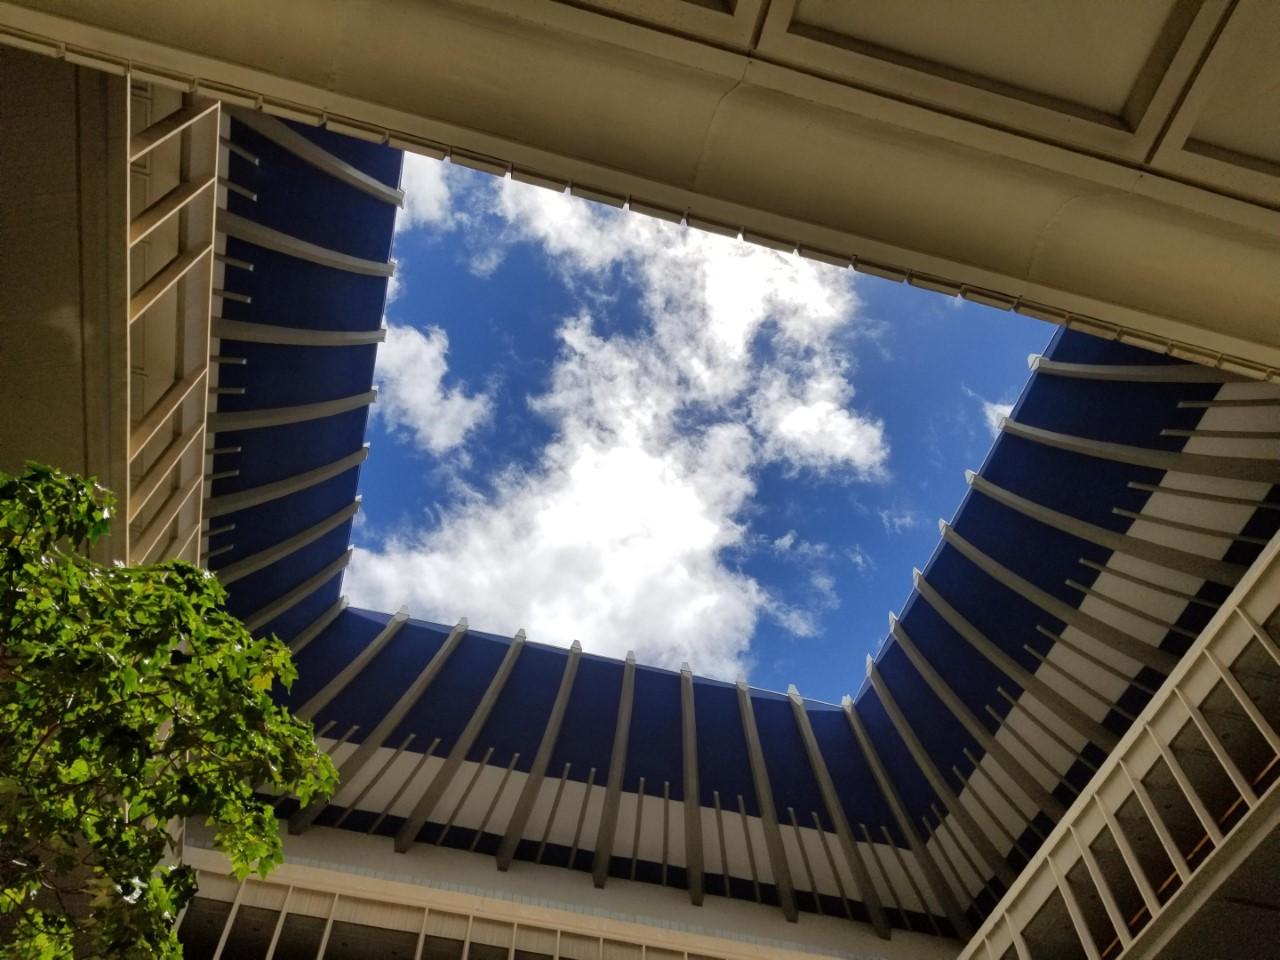 Capitol Skylight-14May19.jpg